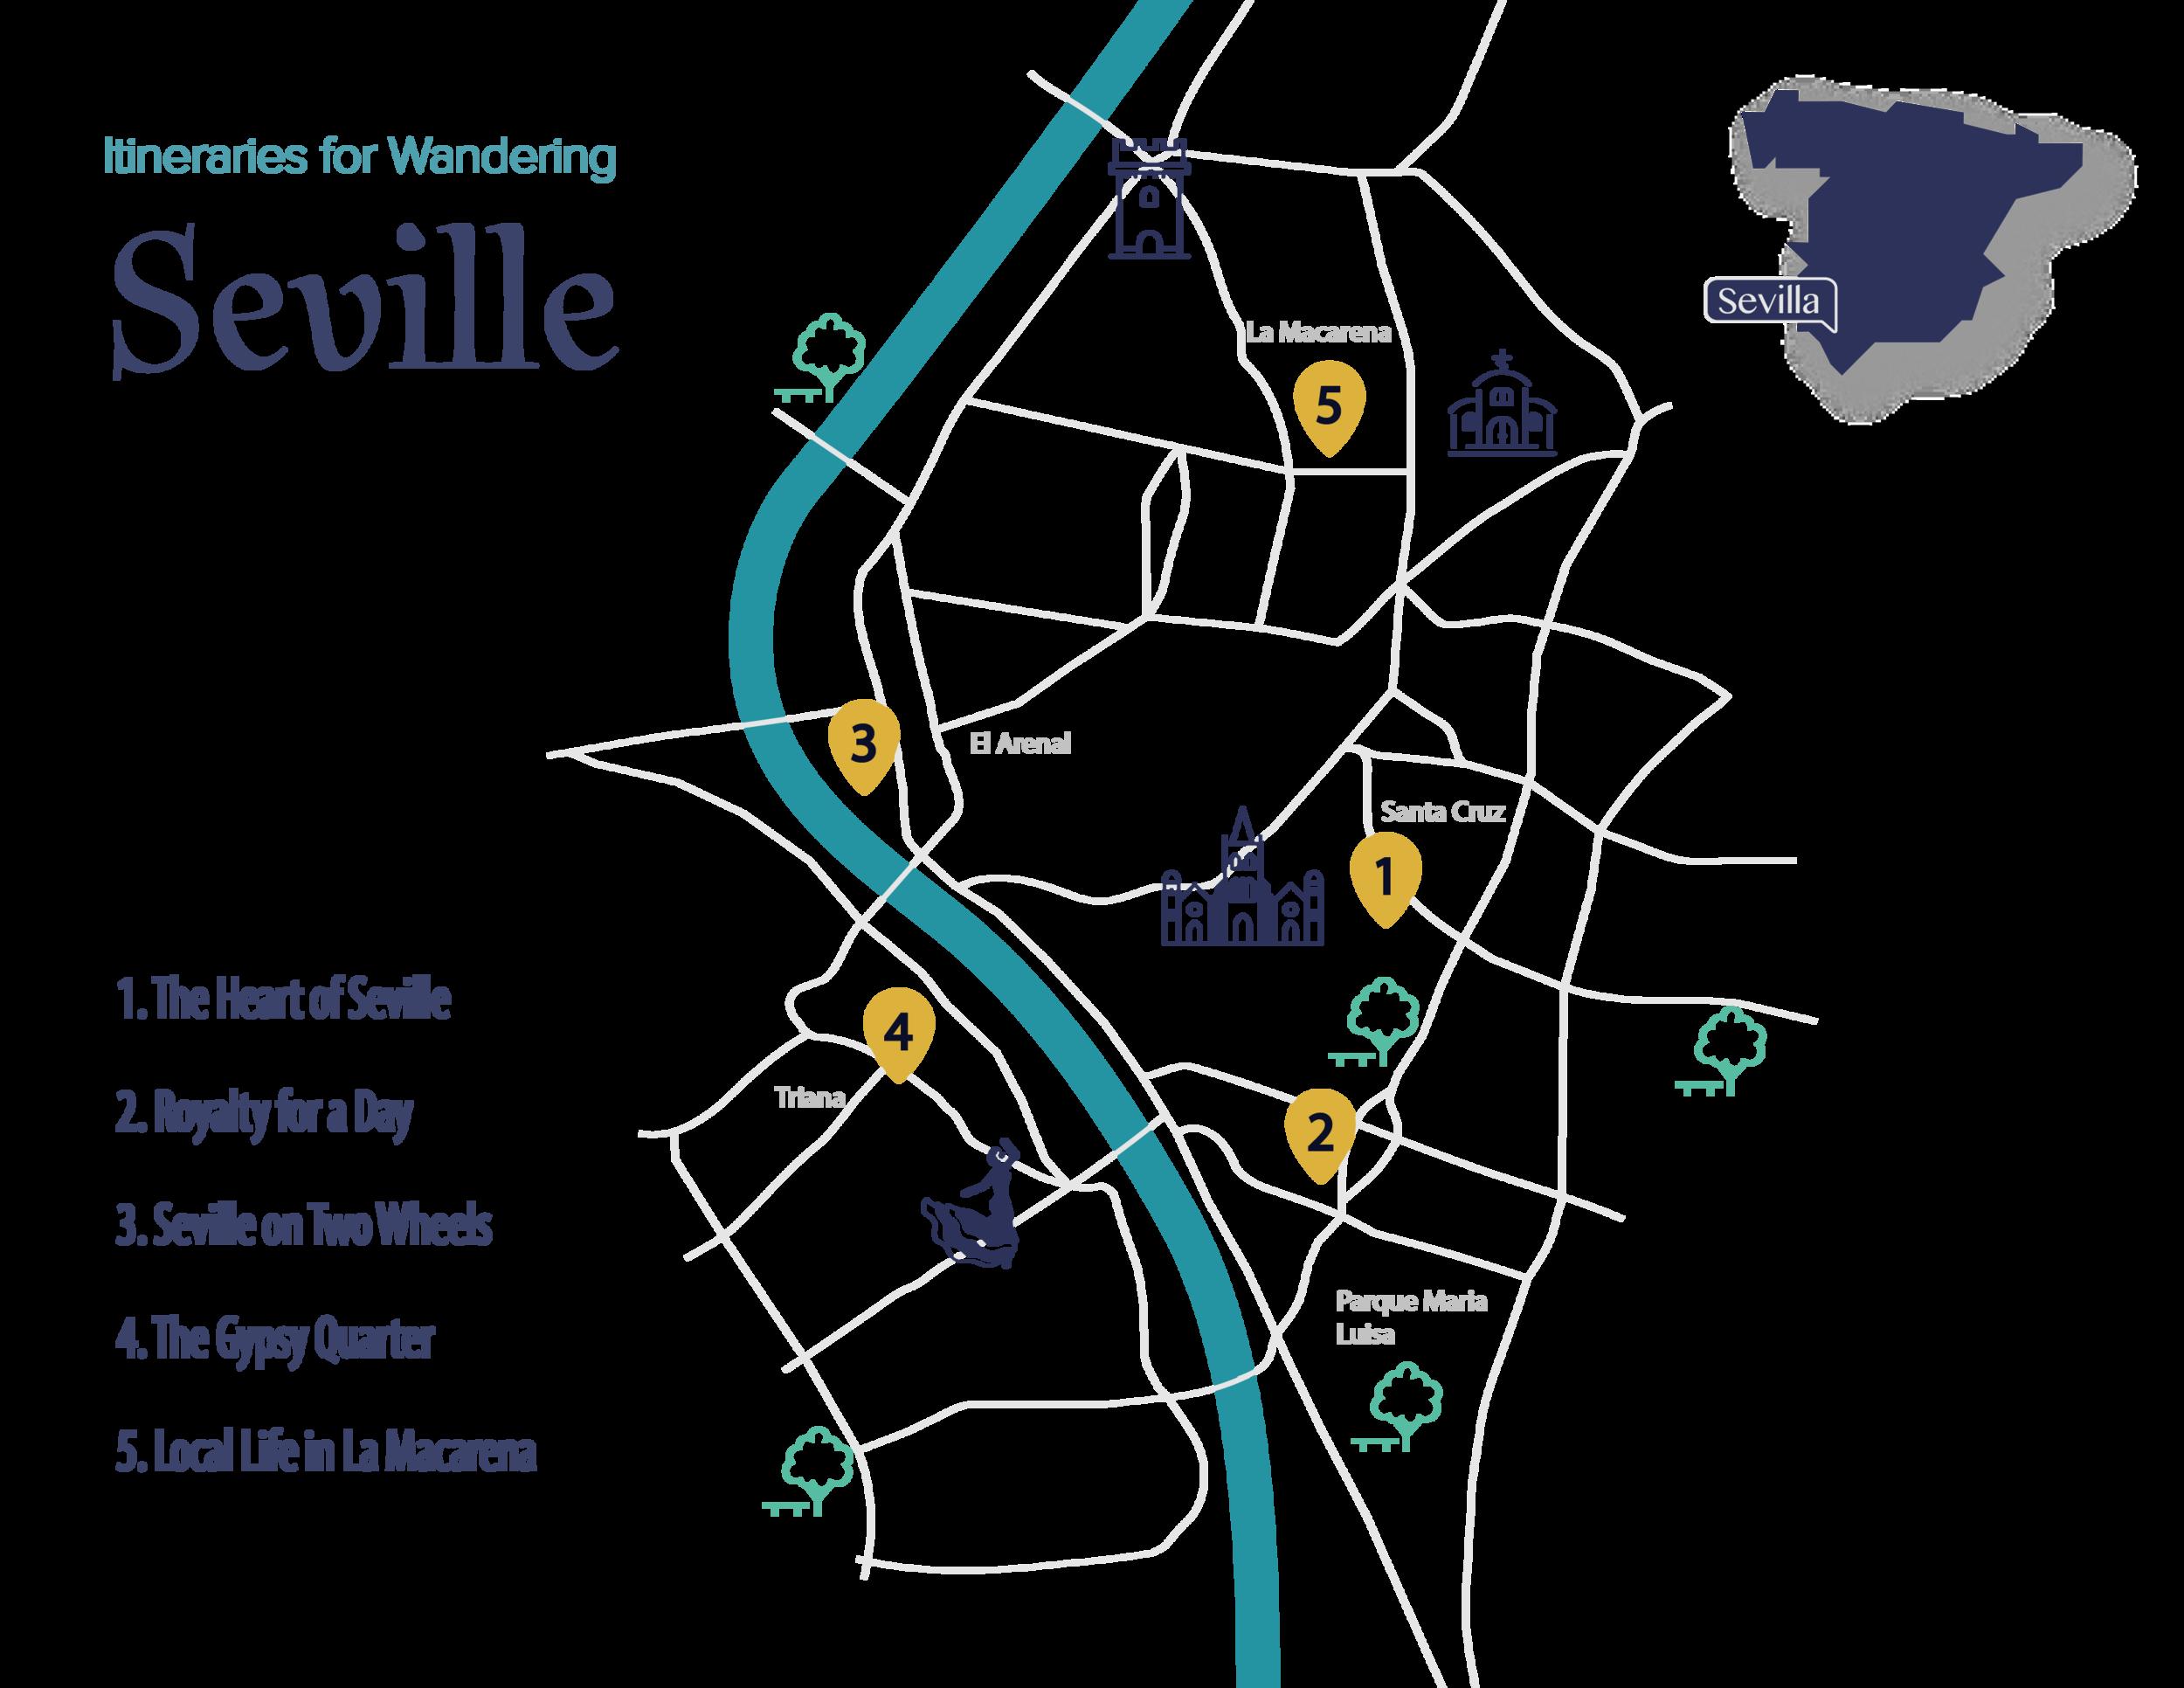 SevilleMap.png